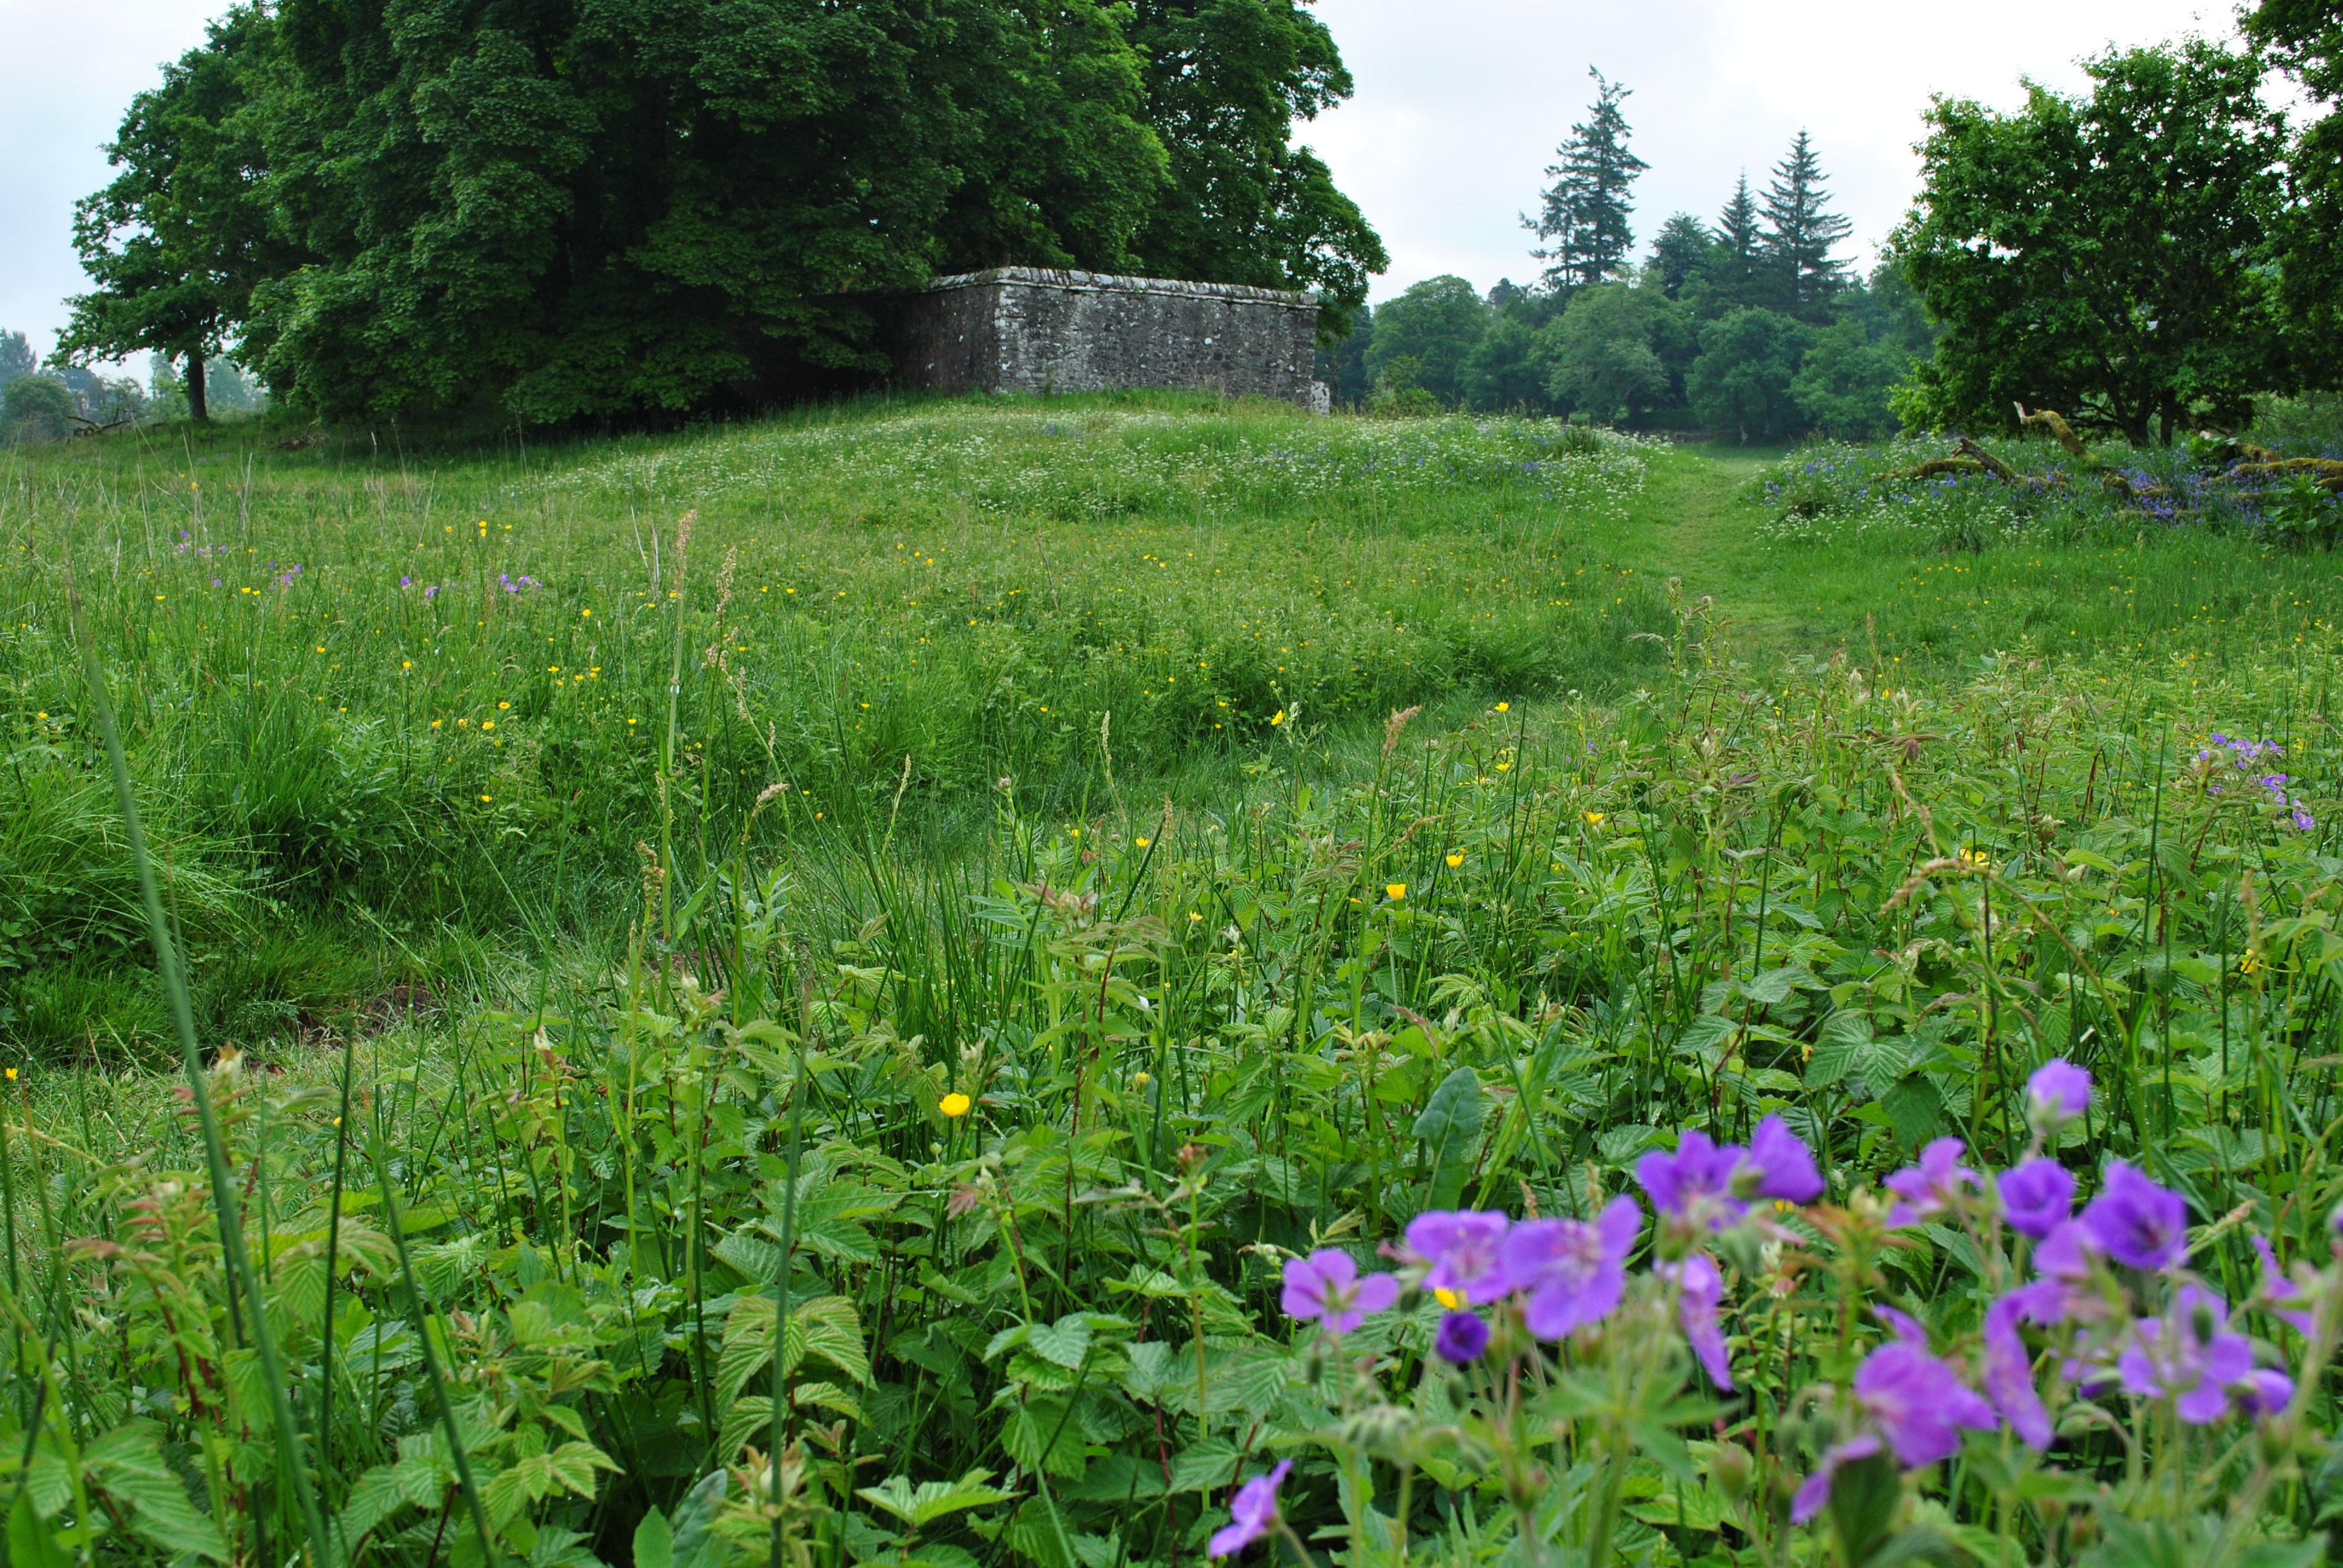 The Highland's sacred bard